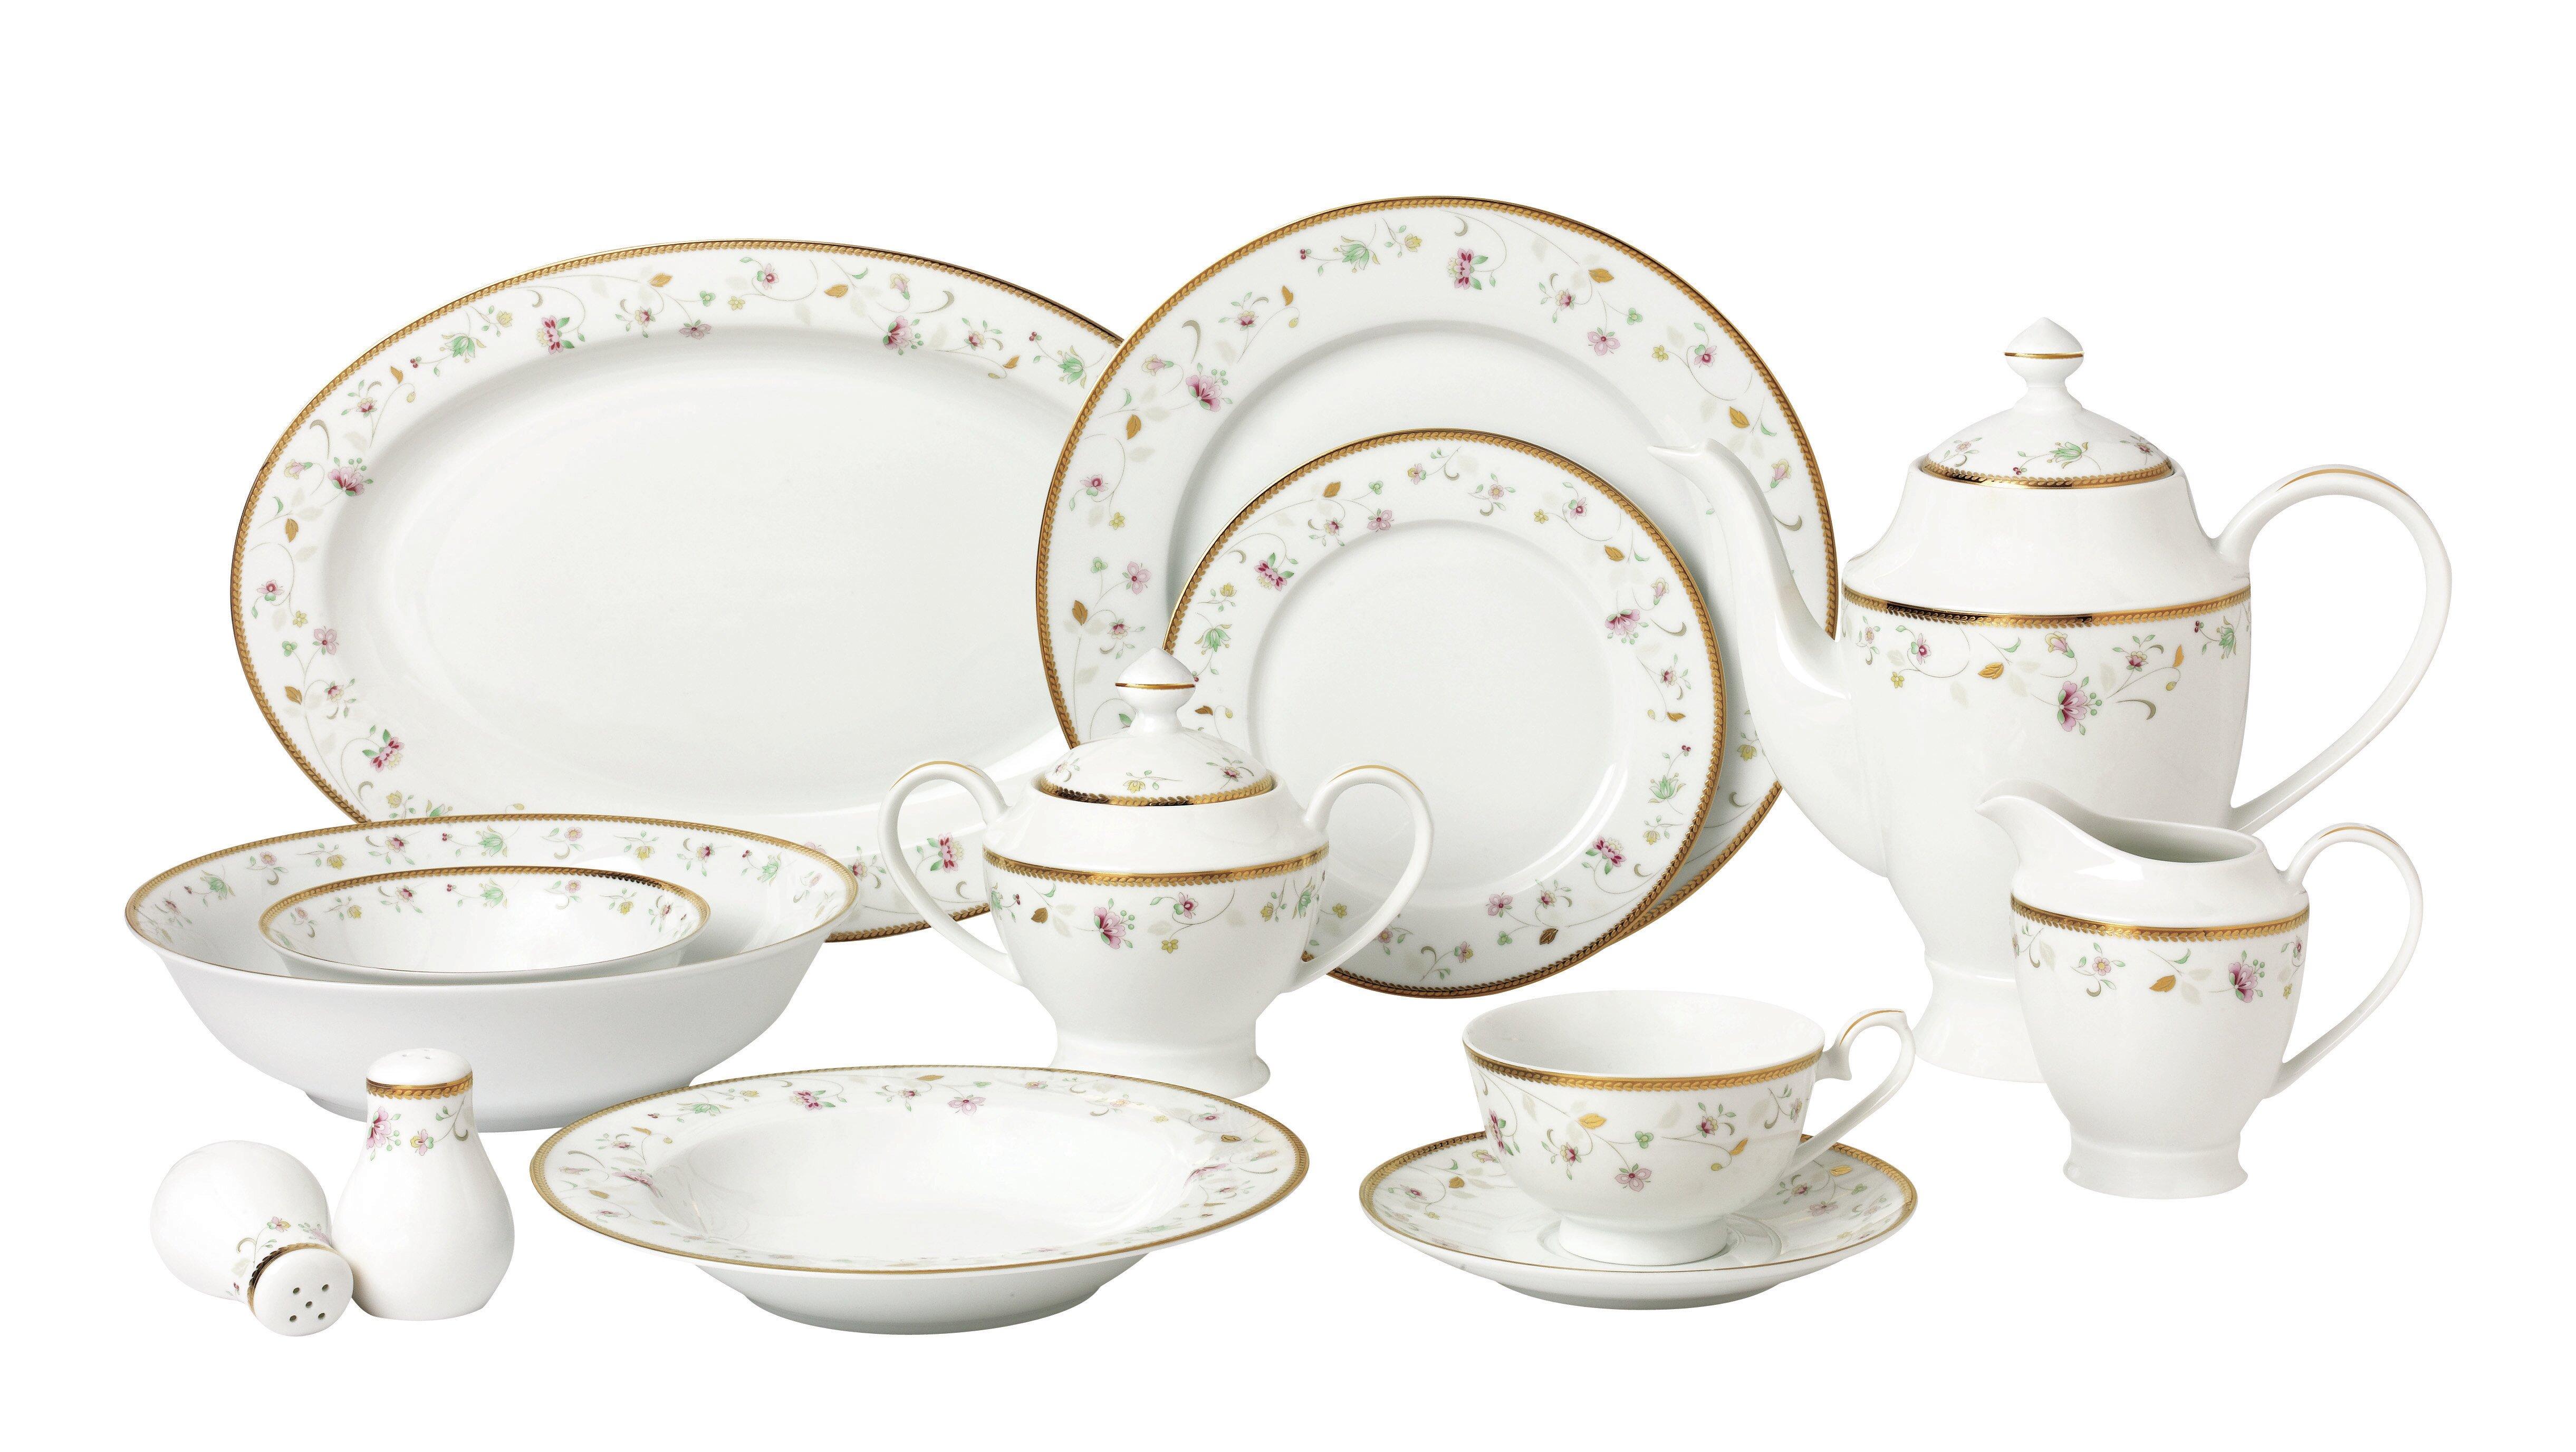 Lorren Home Trends La Luna Bone China 57 Piece Dinnerware Set ...